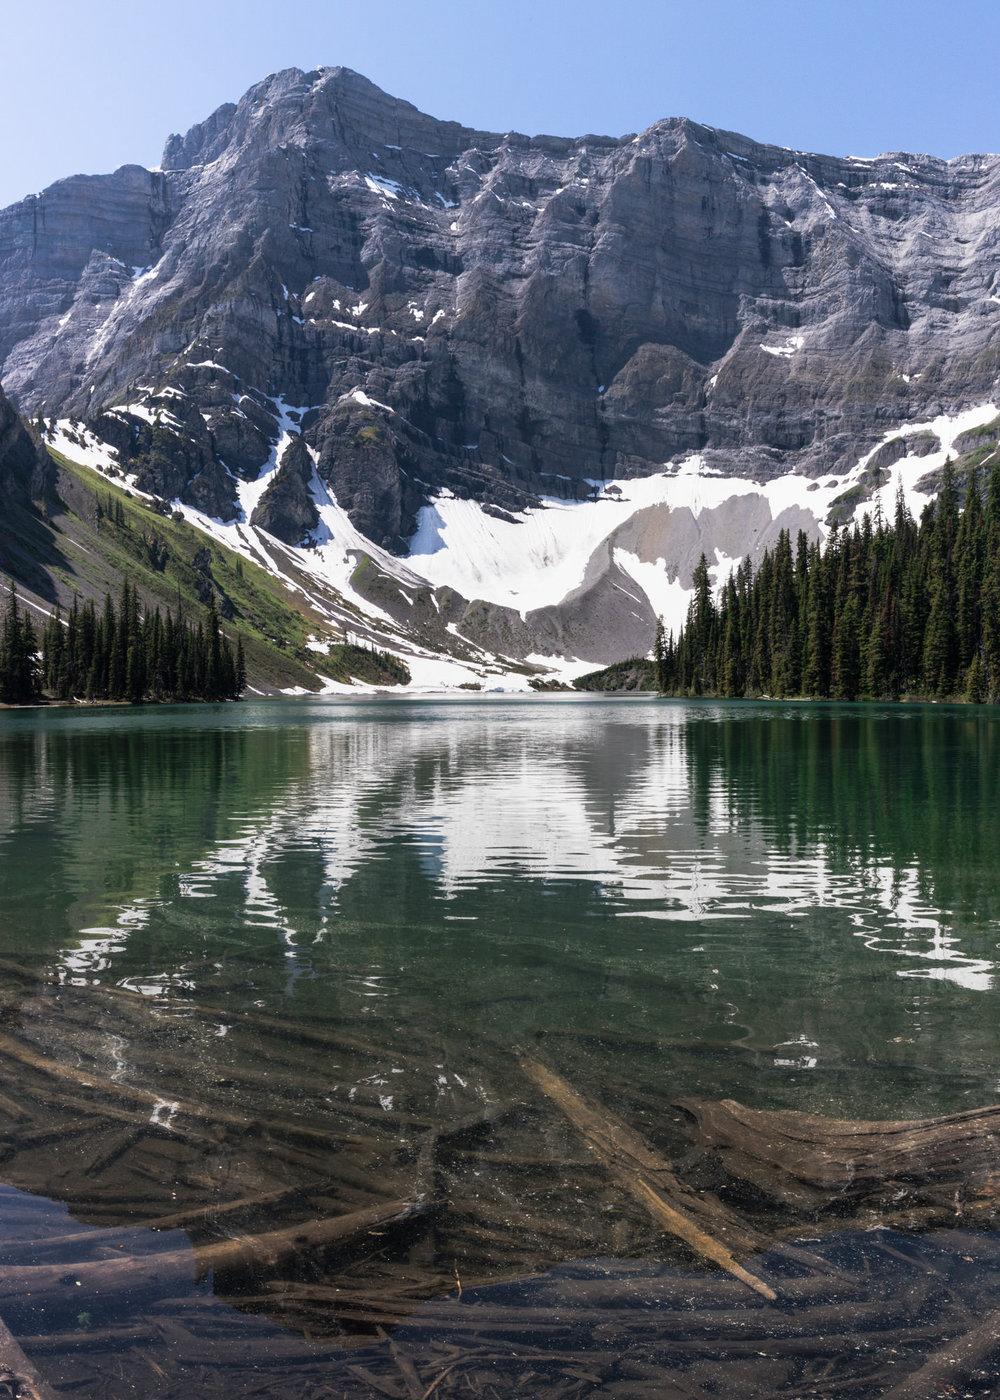 Sweet mountain river,  come take me away. (185 of 365)